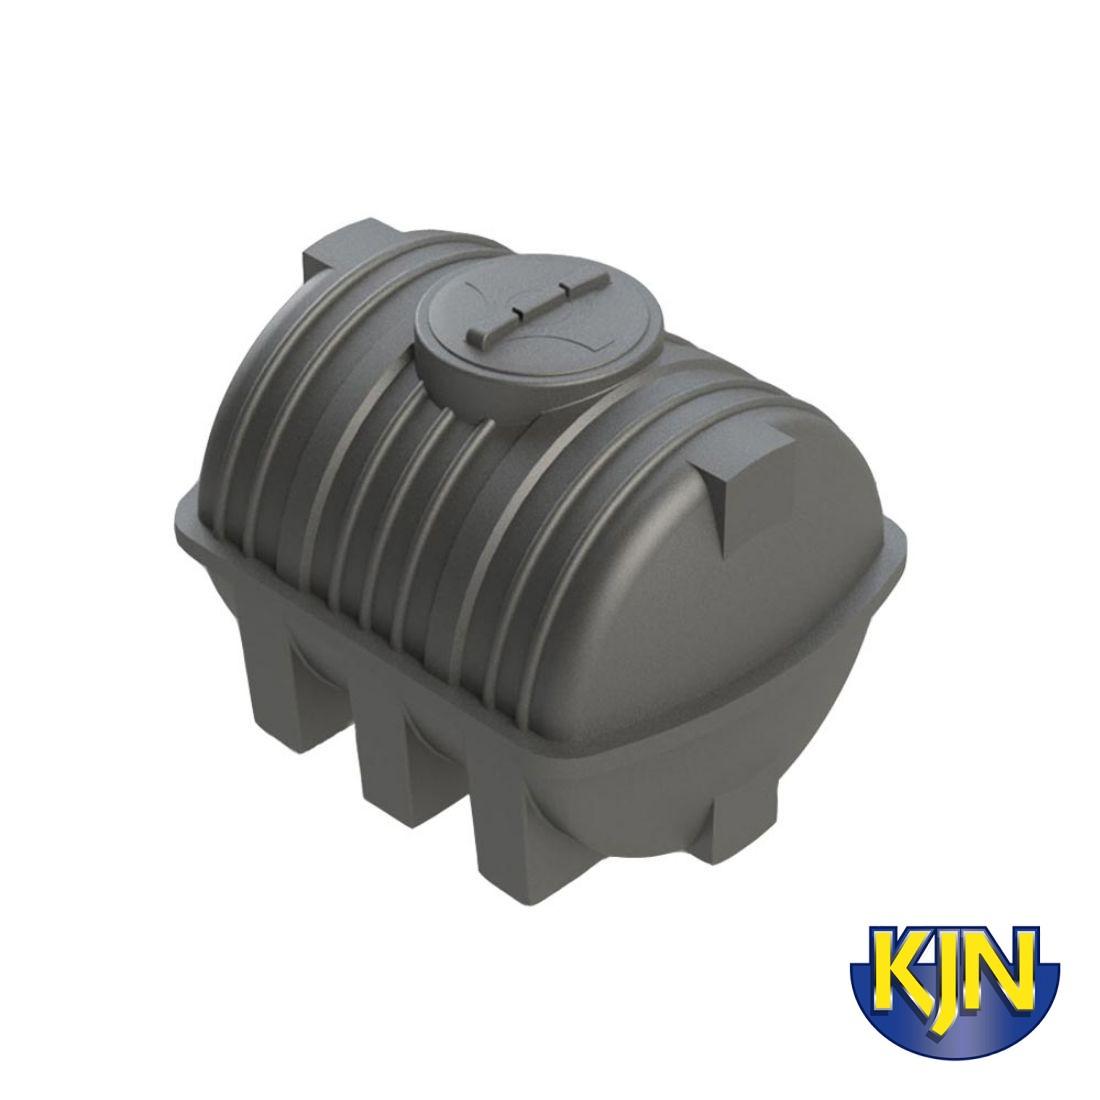 Enduramaxx 1000 Litre Slimline Horizontal Static Non-Potable Water Storage Tank